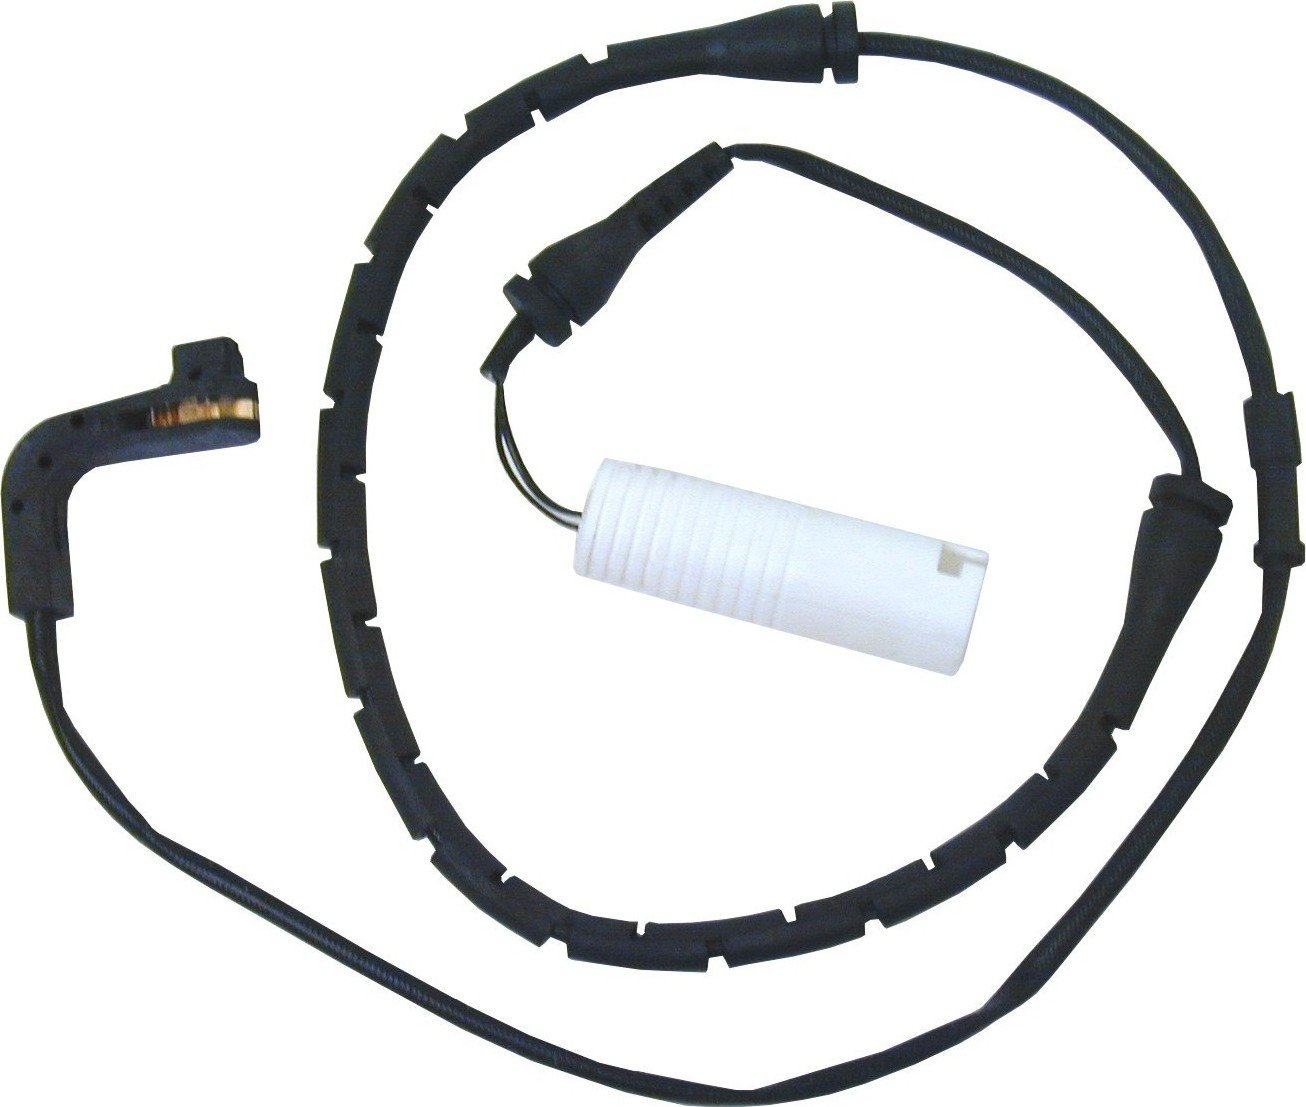 URO Parts 34 35 6 755 266 Front Brake Pad Sensor by URO Parts